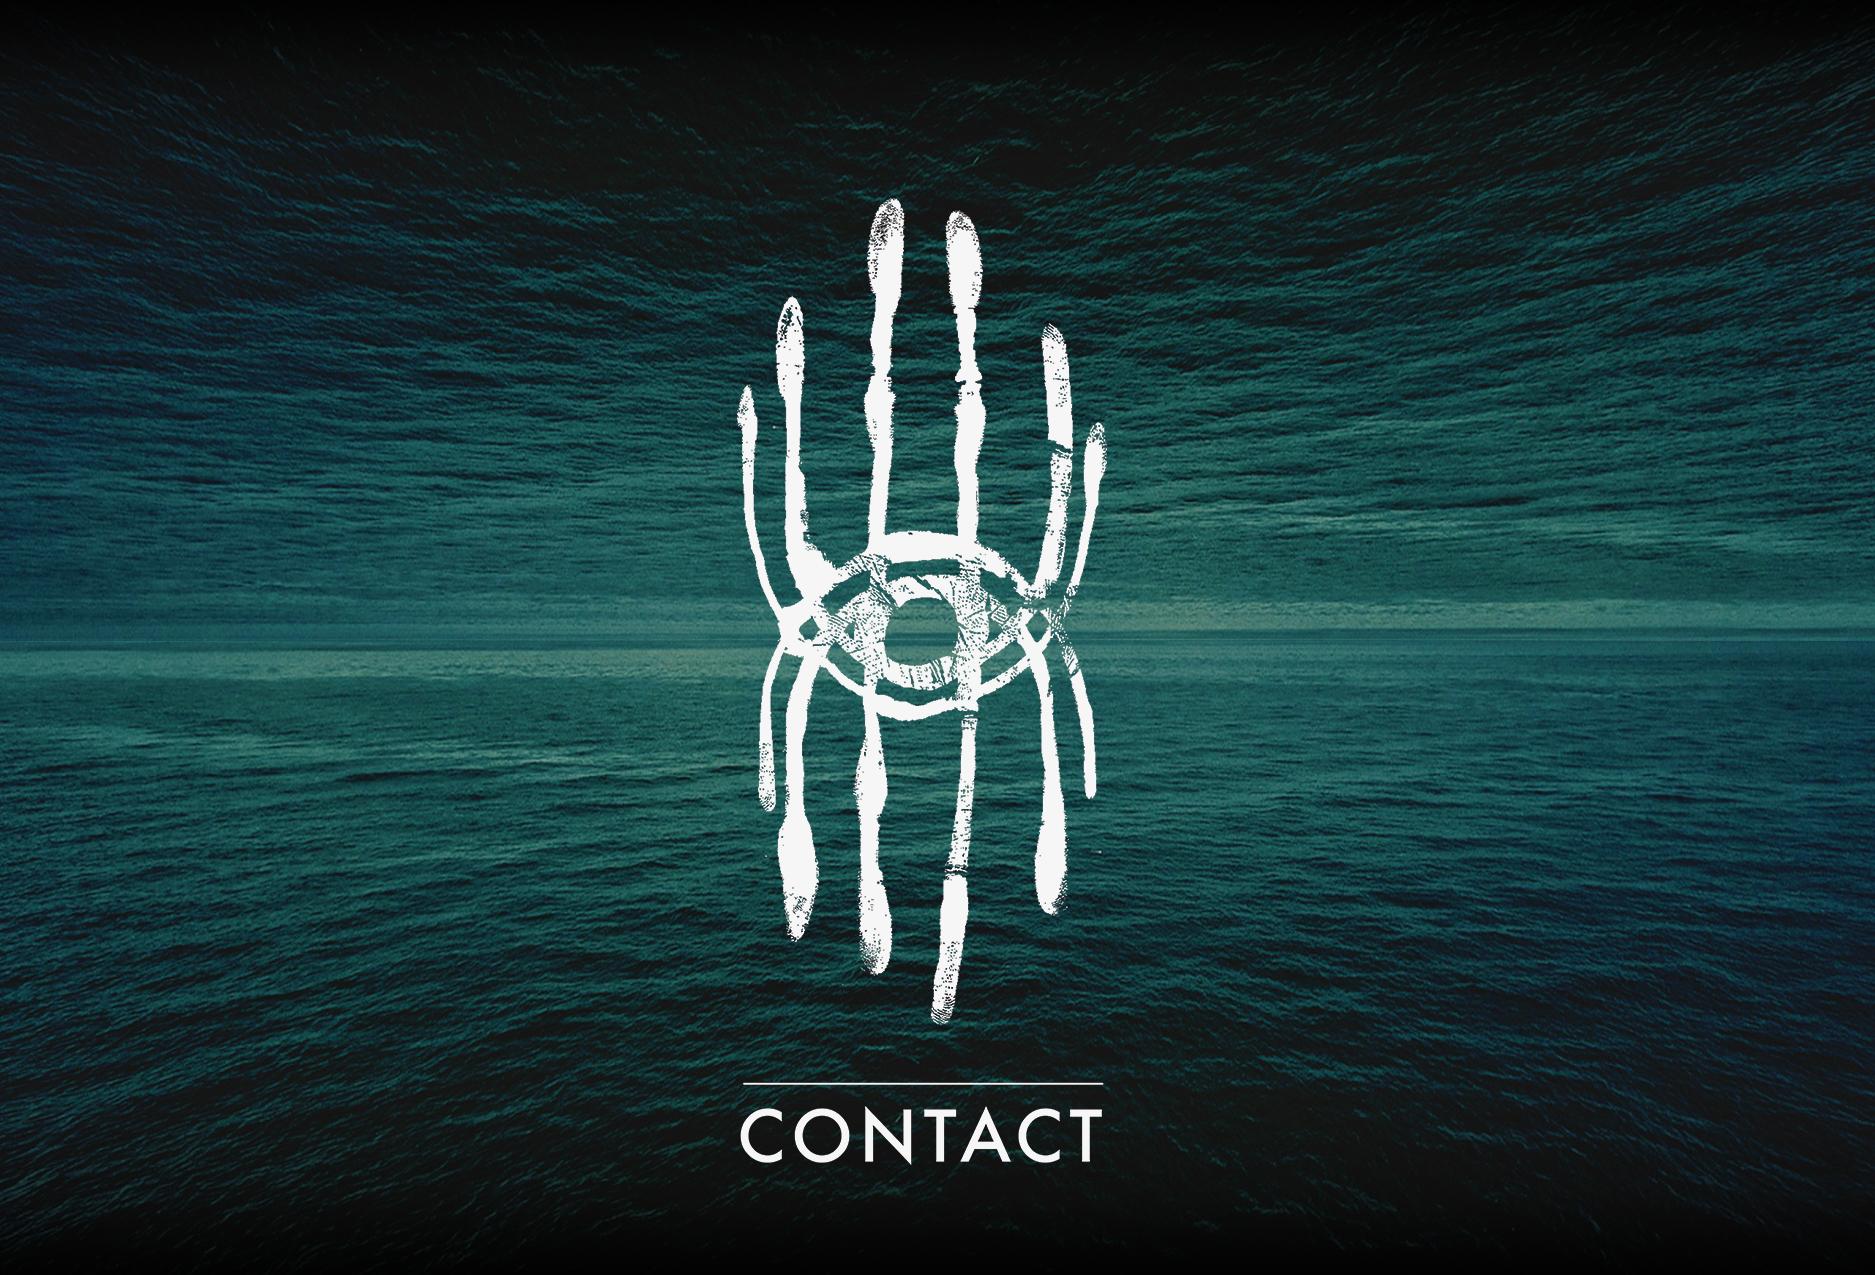 contact-logo-jkp-2014-001.jpg